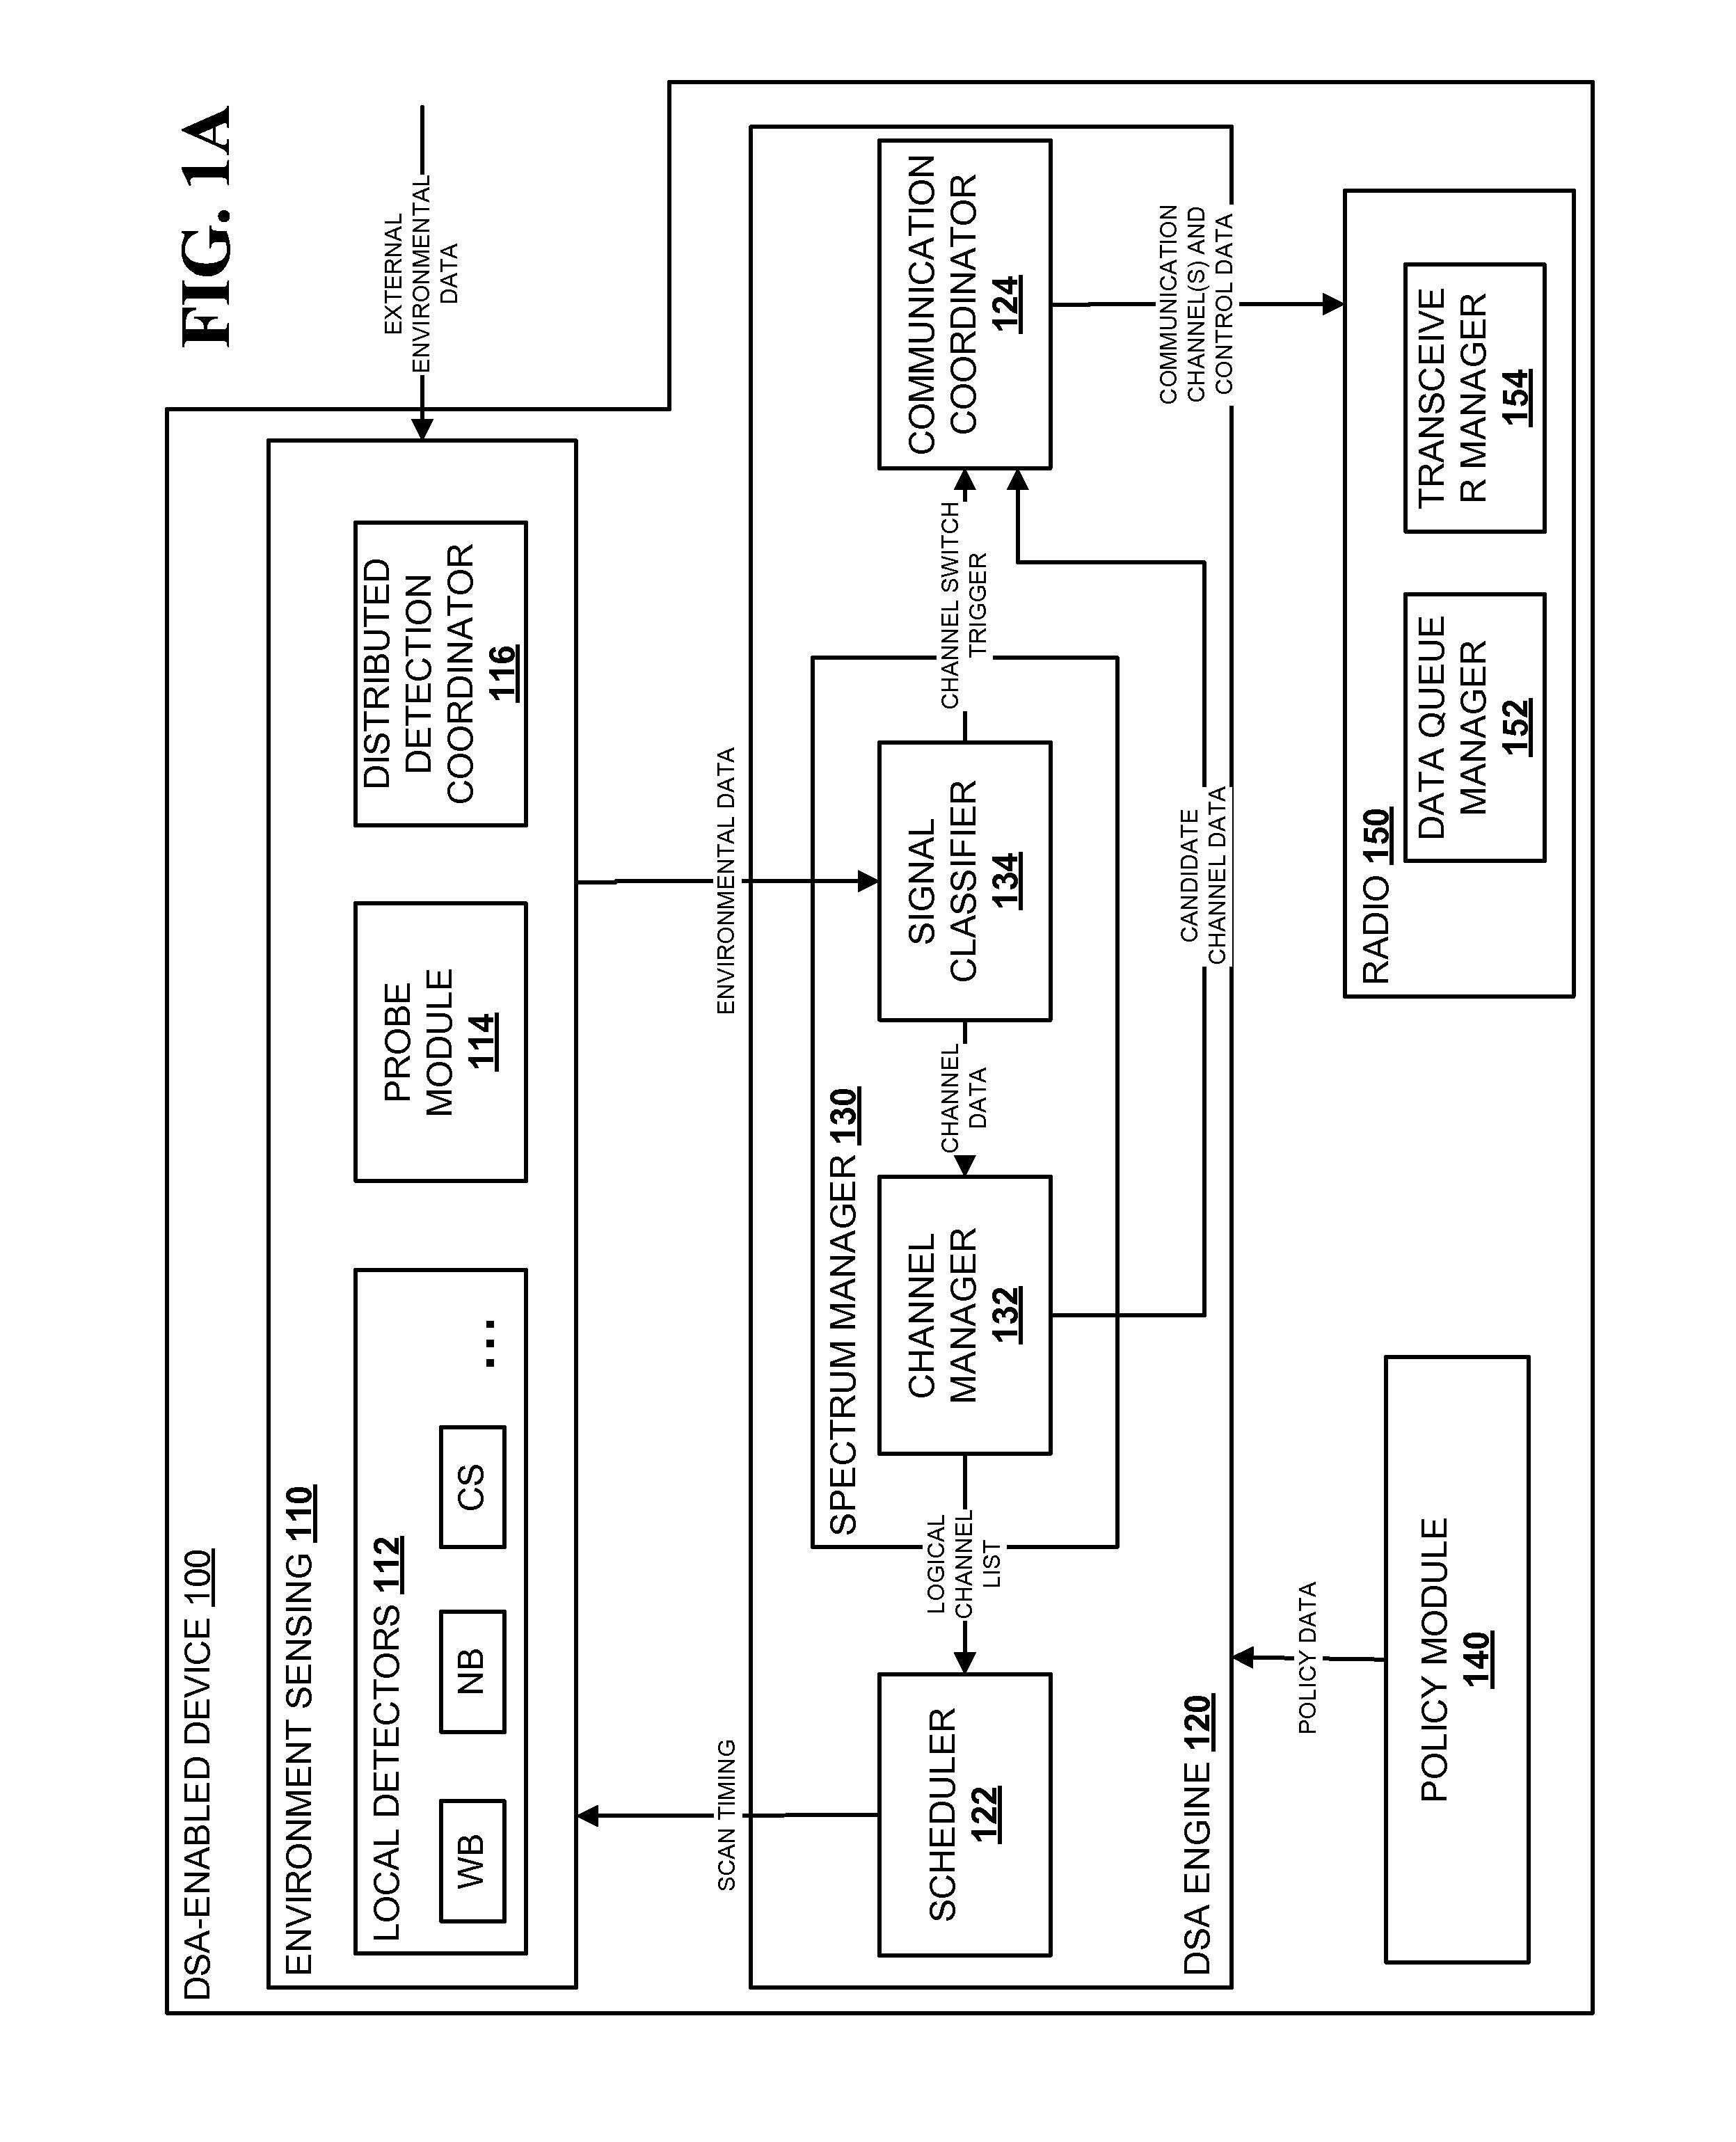 Patent US 9,900,782 B2